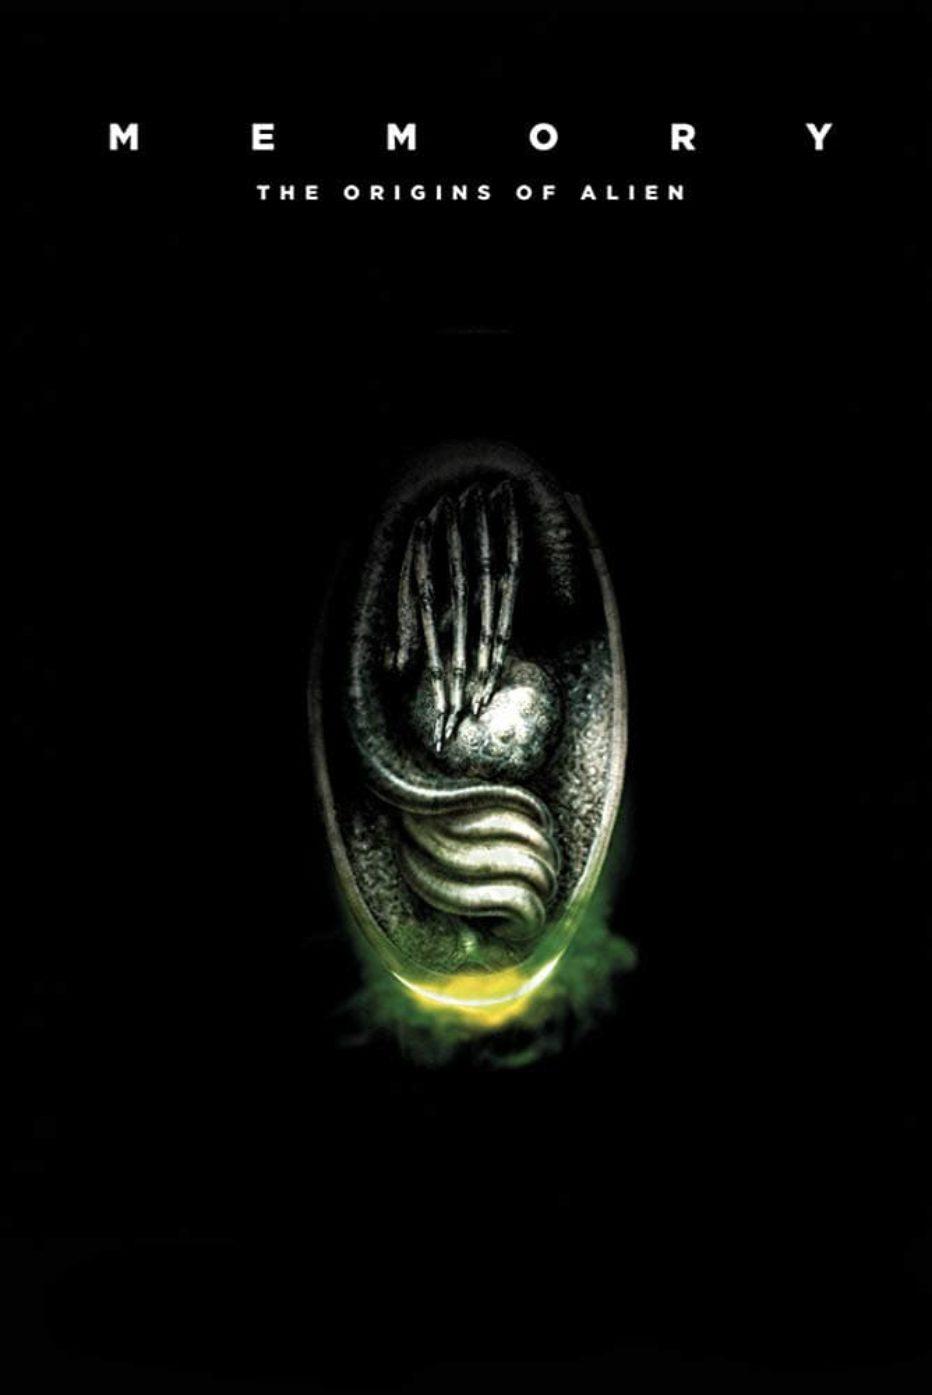 Memory – The origins of Alien